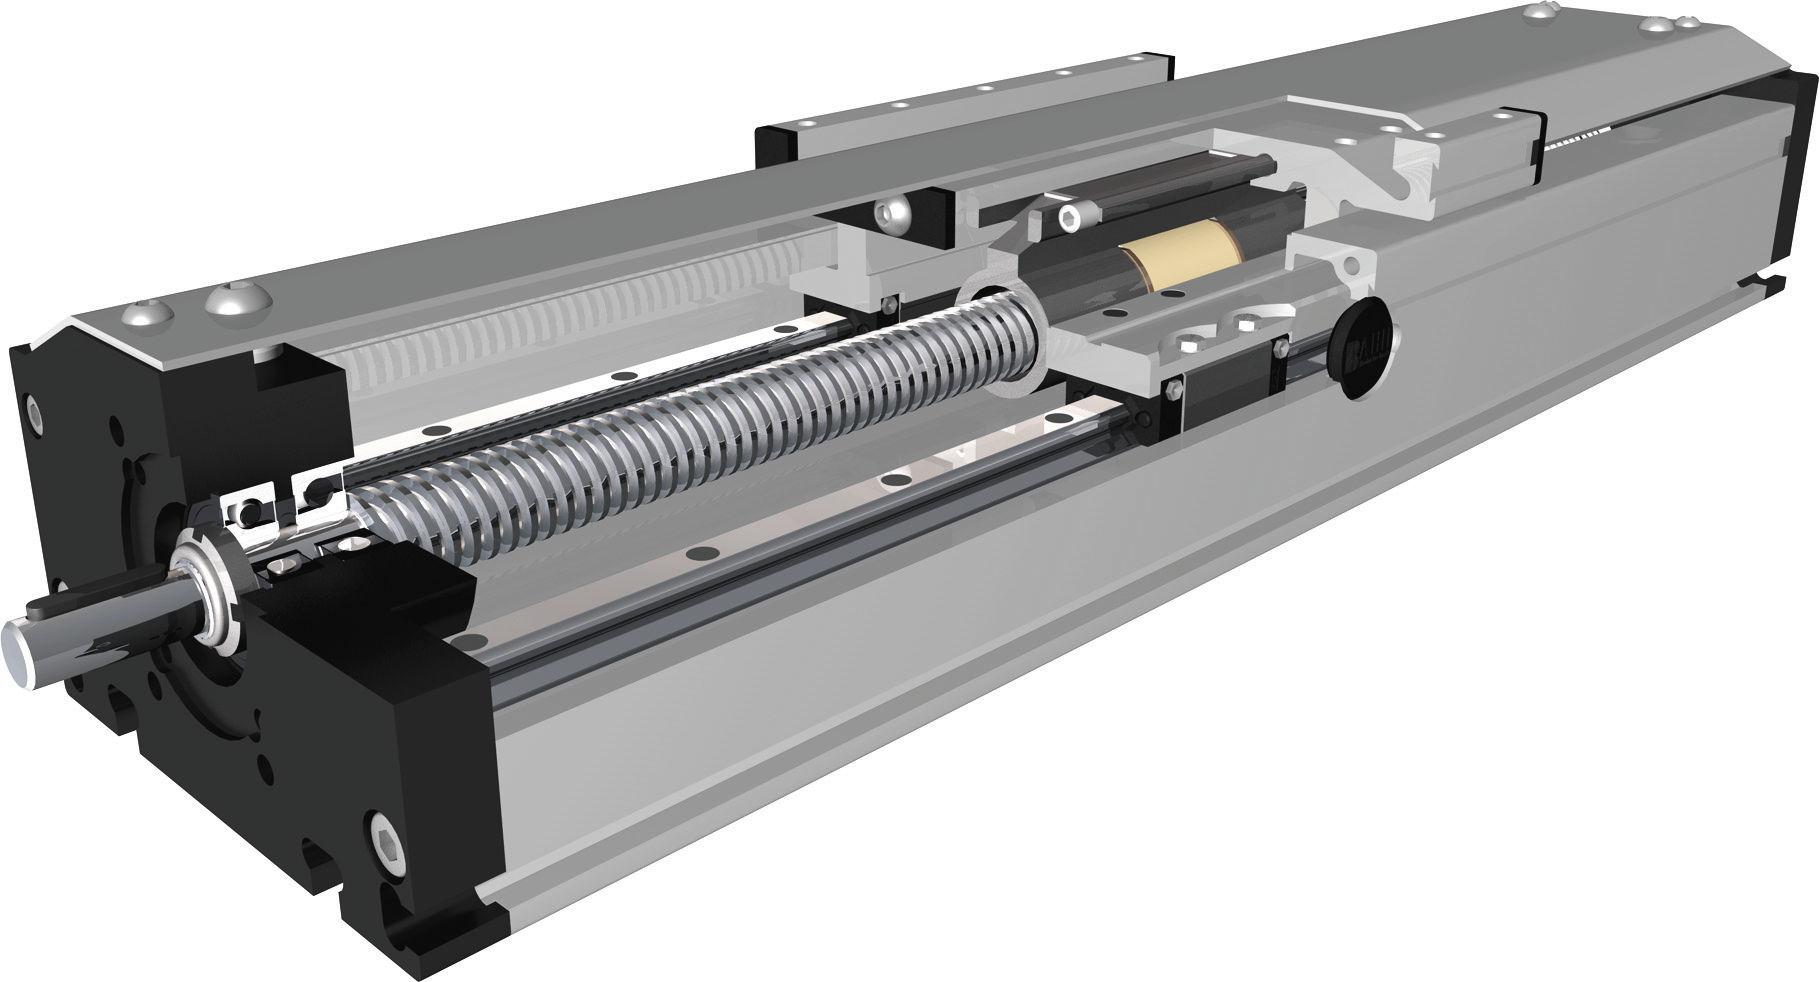 ball screw. electric linear unit / ball screw dst-p, dsk-p bahr modultechnik gmbh n